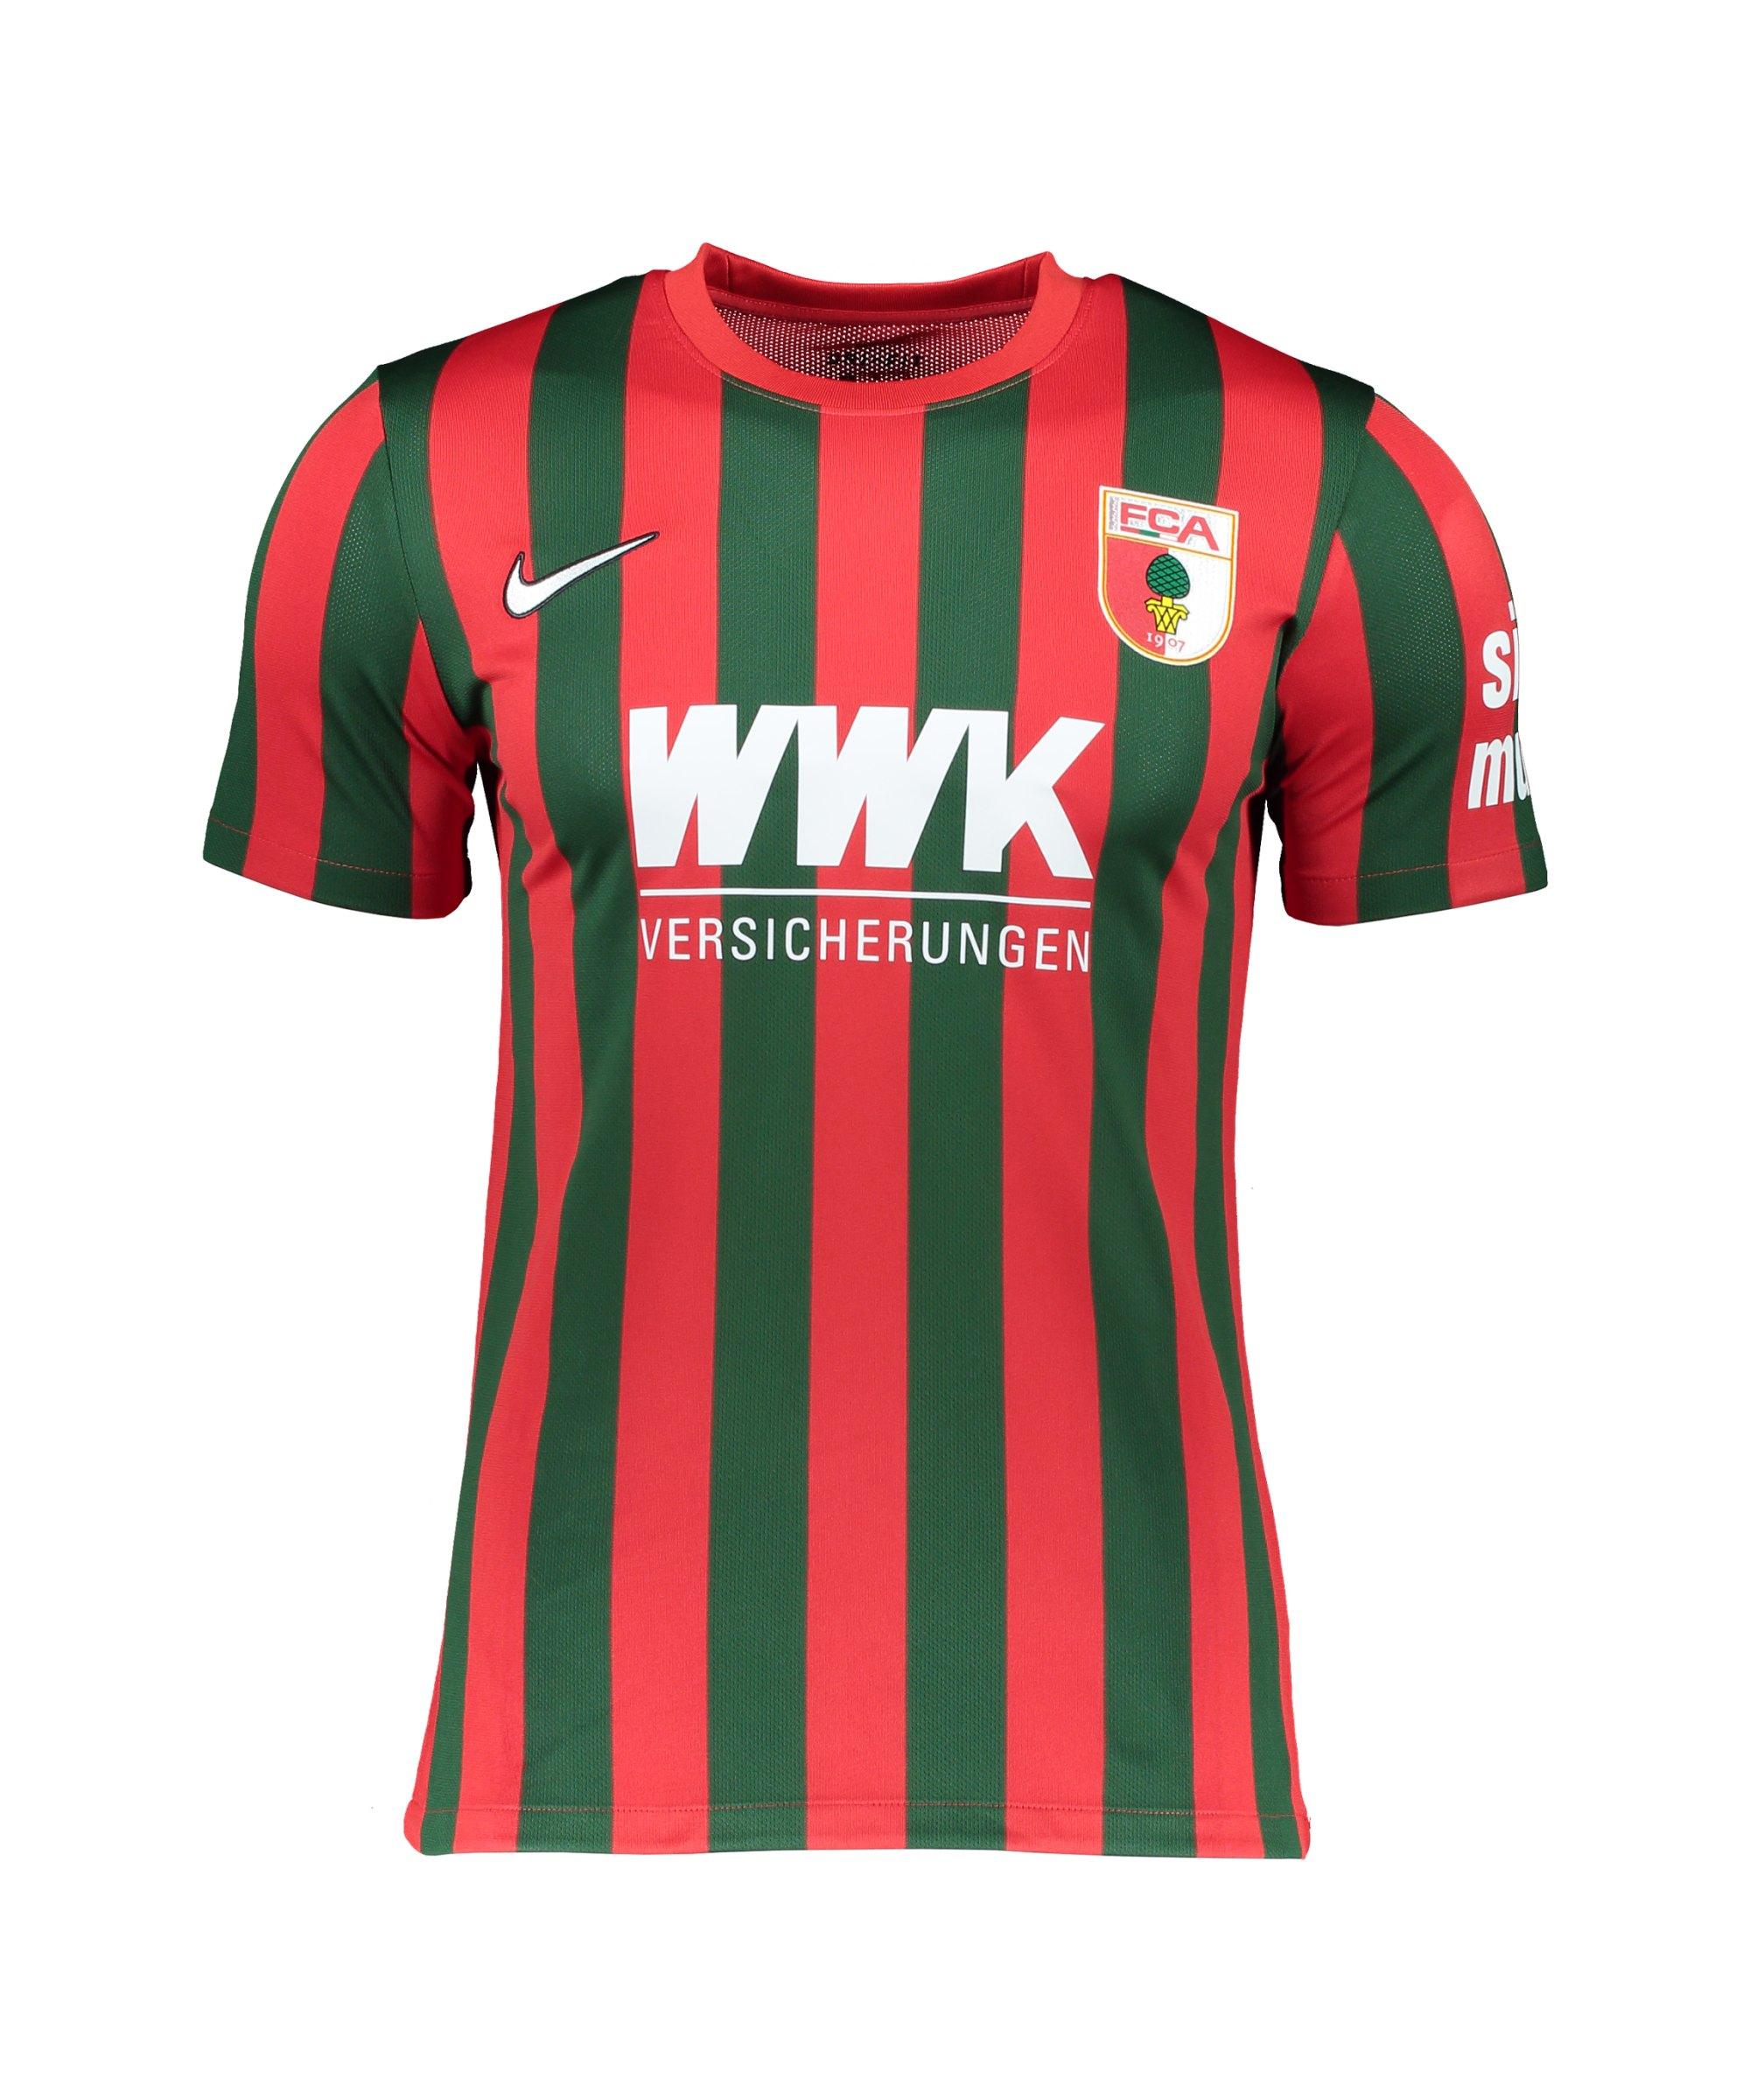 Nike FC Augsburg Trikot Home 2021/2022 Rot Grün F659 - rot